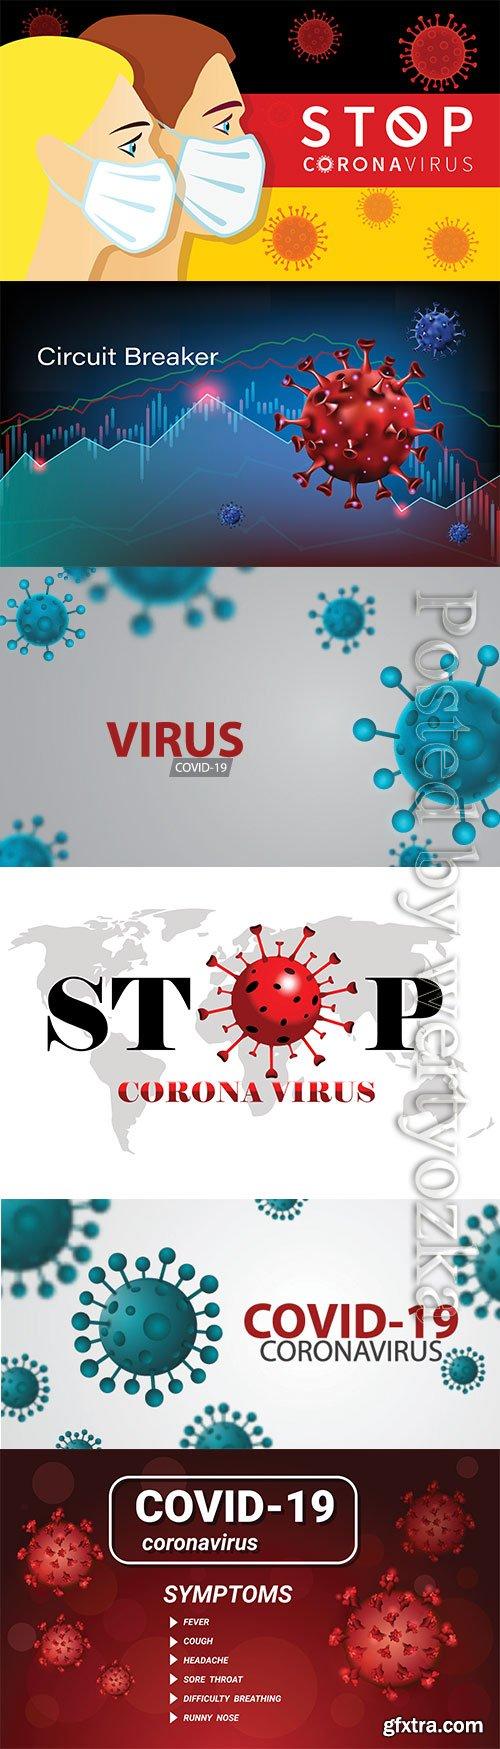 Pandemic coronavirus or covid-19 virus effect to stock market business